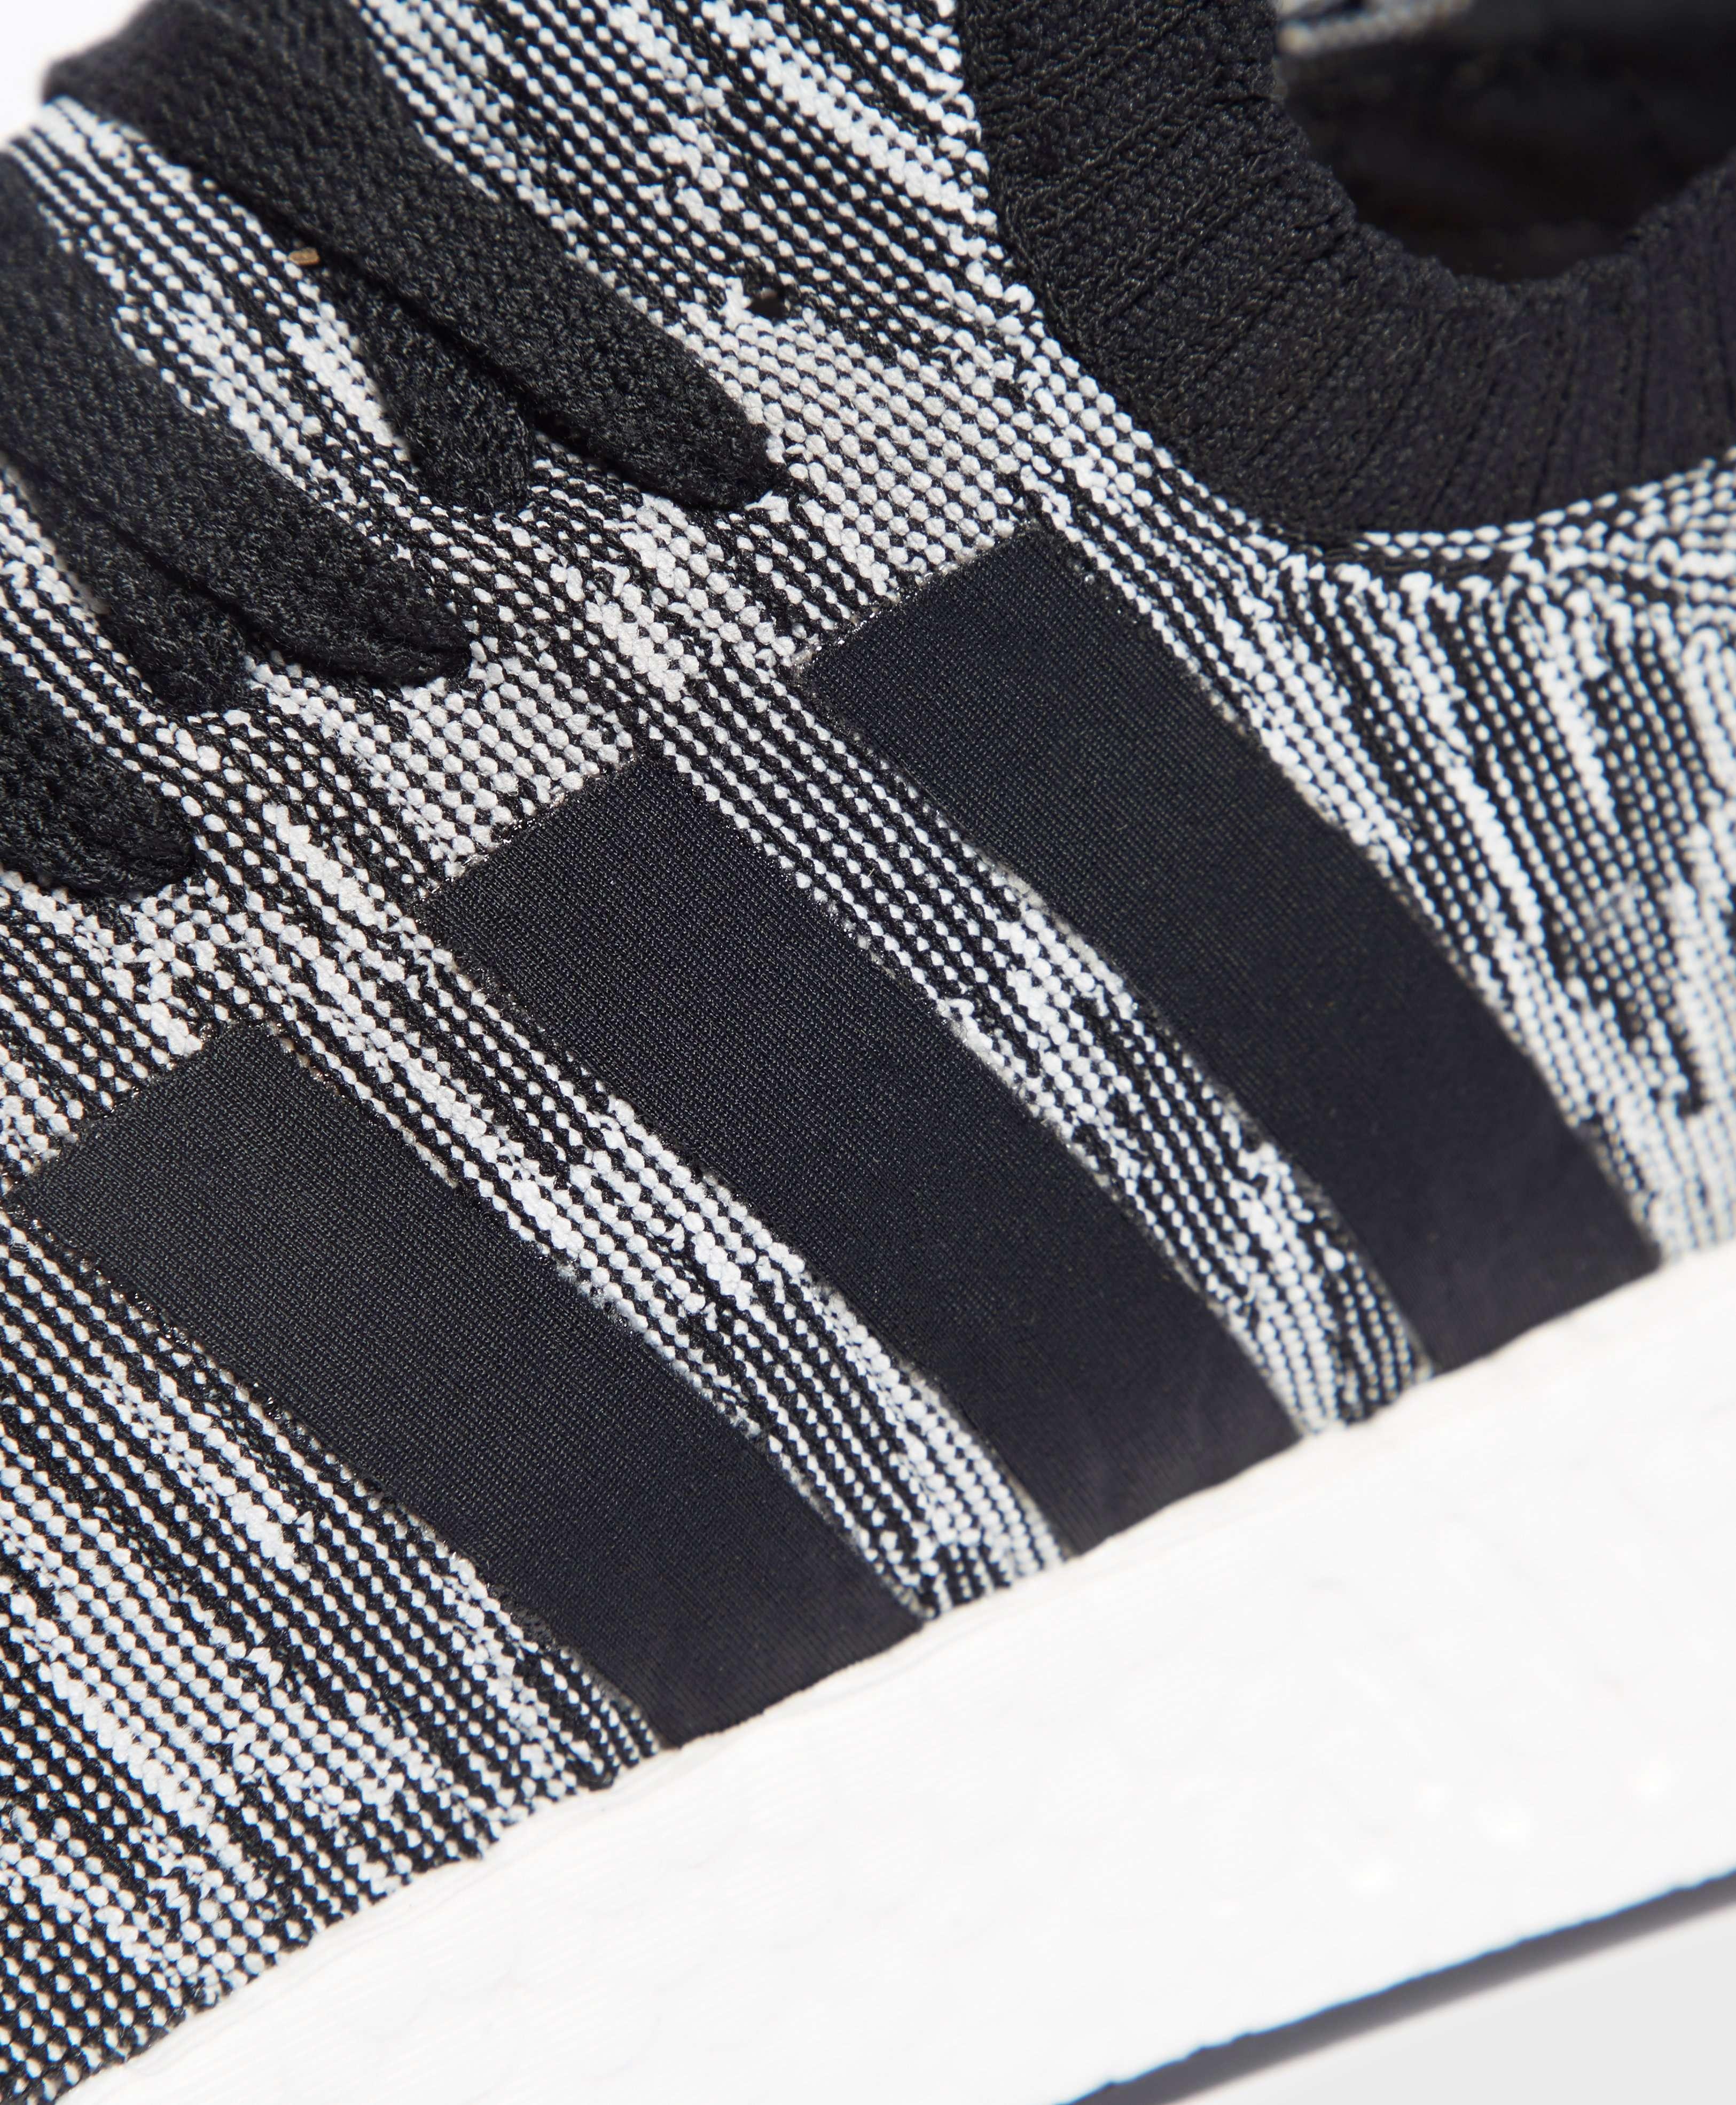 adidas Originals NMD_R2 Boost Primeknit